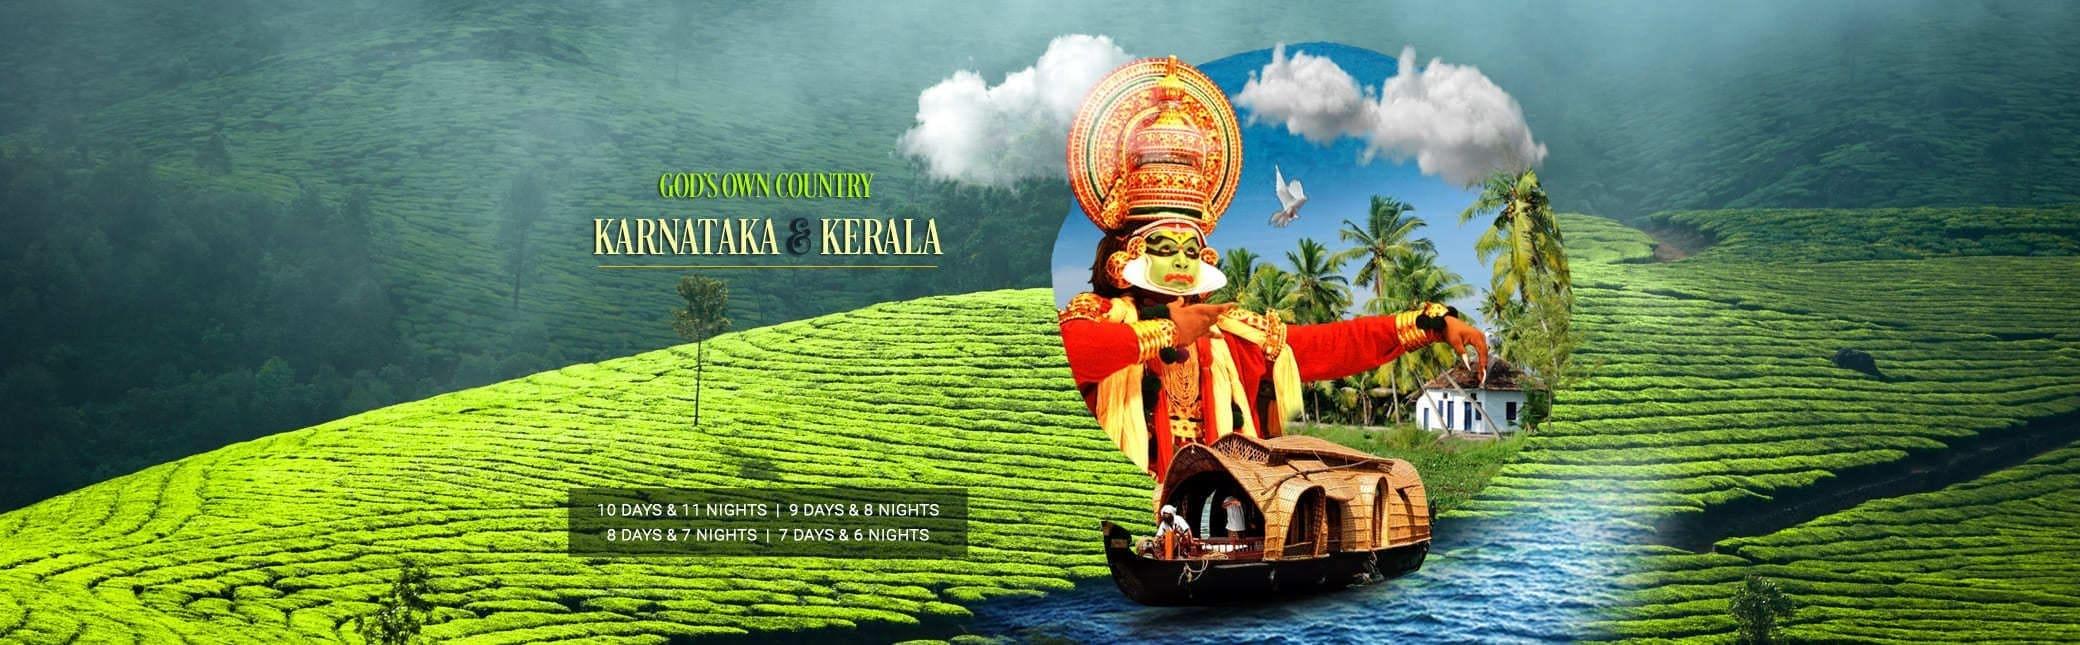 Karnataka & Kerala Tours